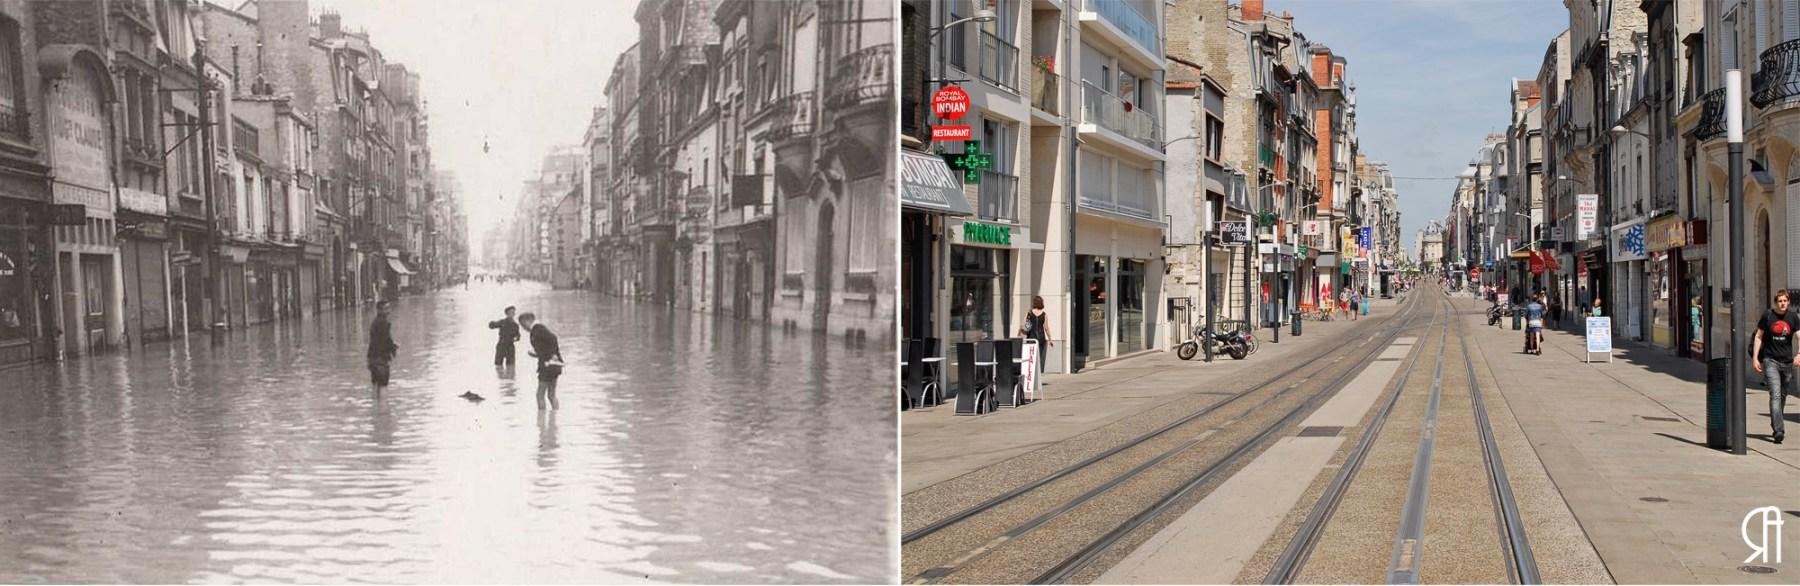 inondation-rue-Vesle